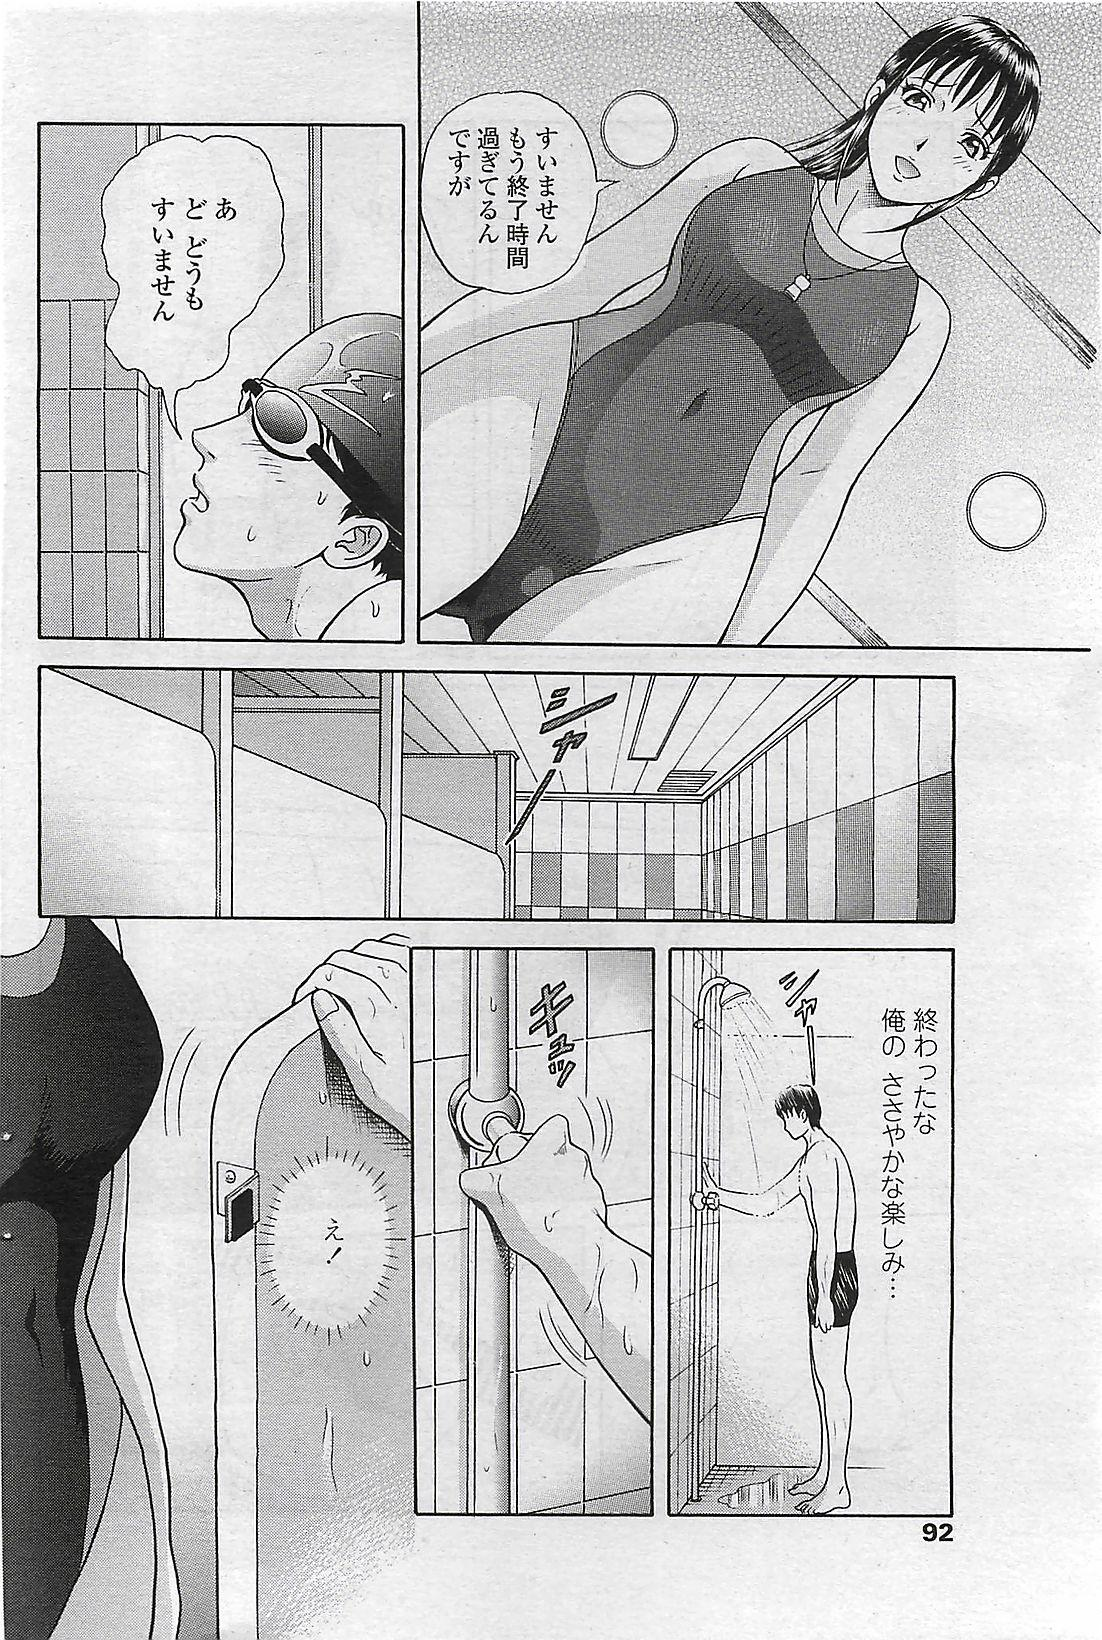 COMIC Penguin Club Sanzokuban 2007-03 93